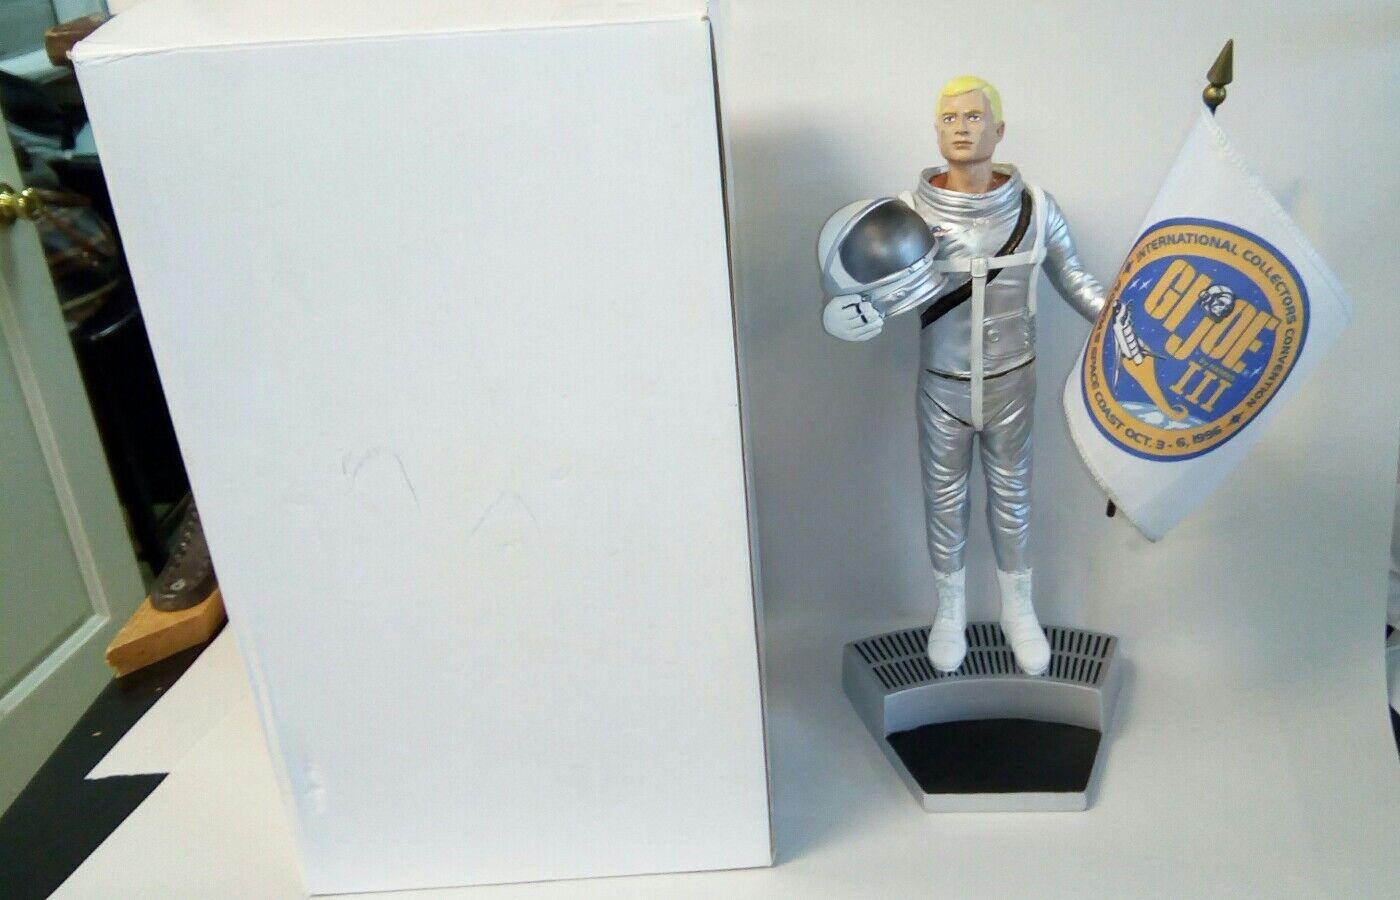 1996 GI Joe Joe Joe Collectors Convention Limited Ed  400 12  Astronaut Statue MIB 990116